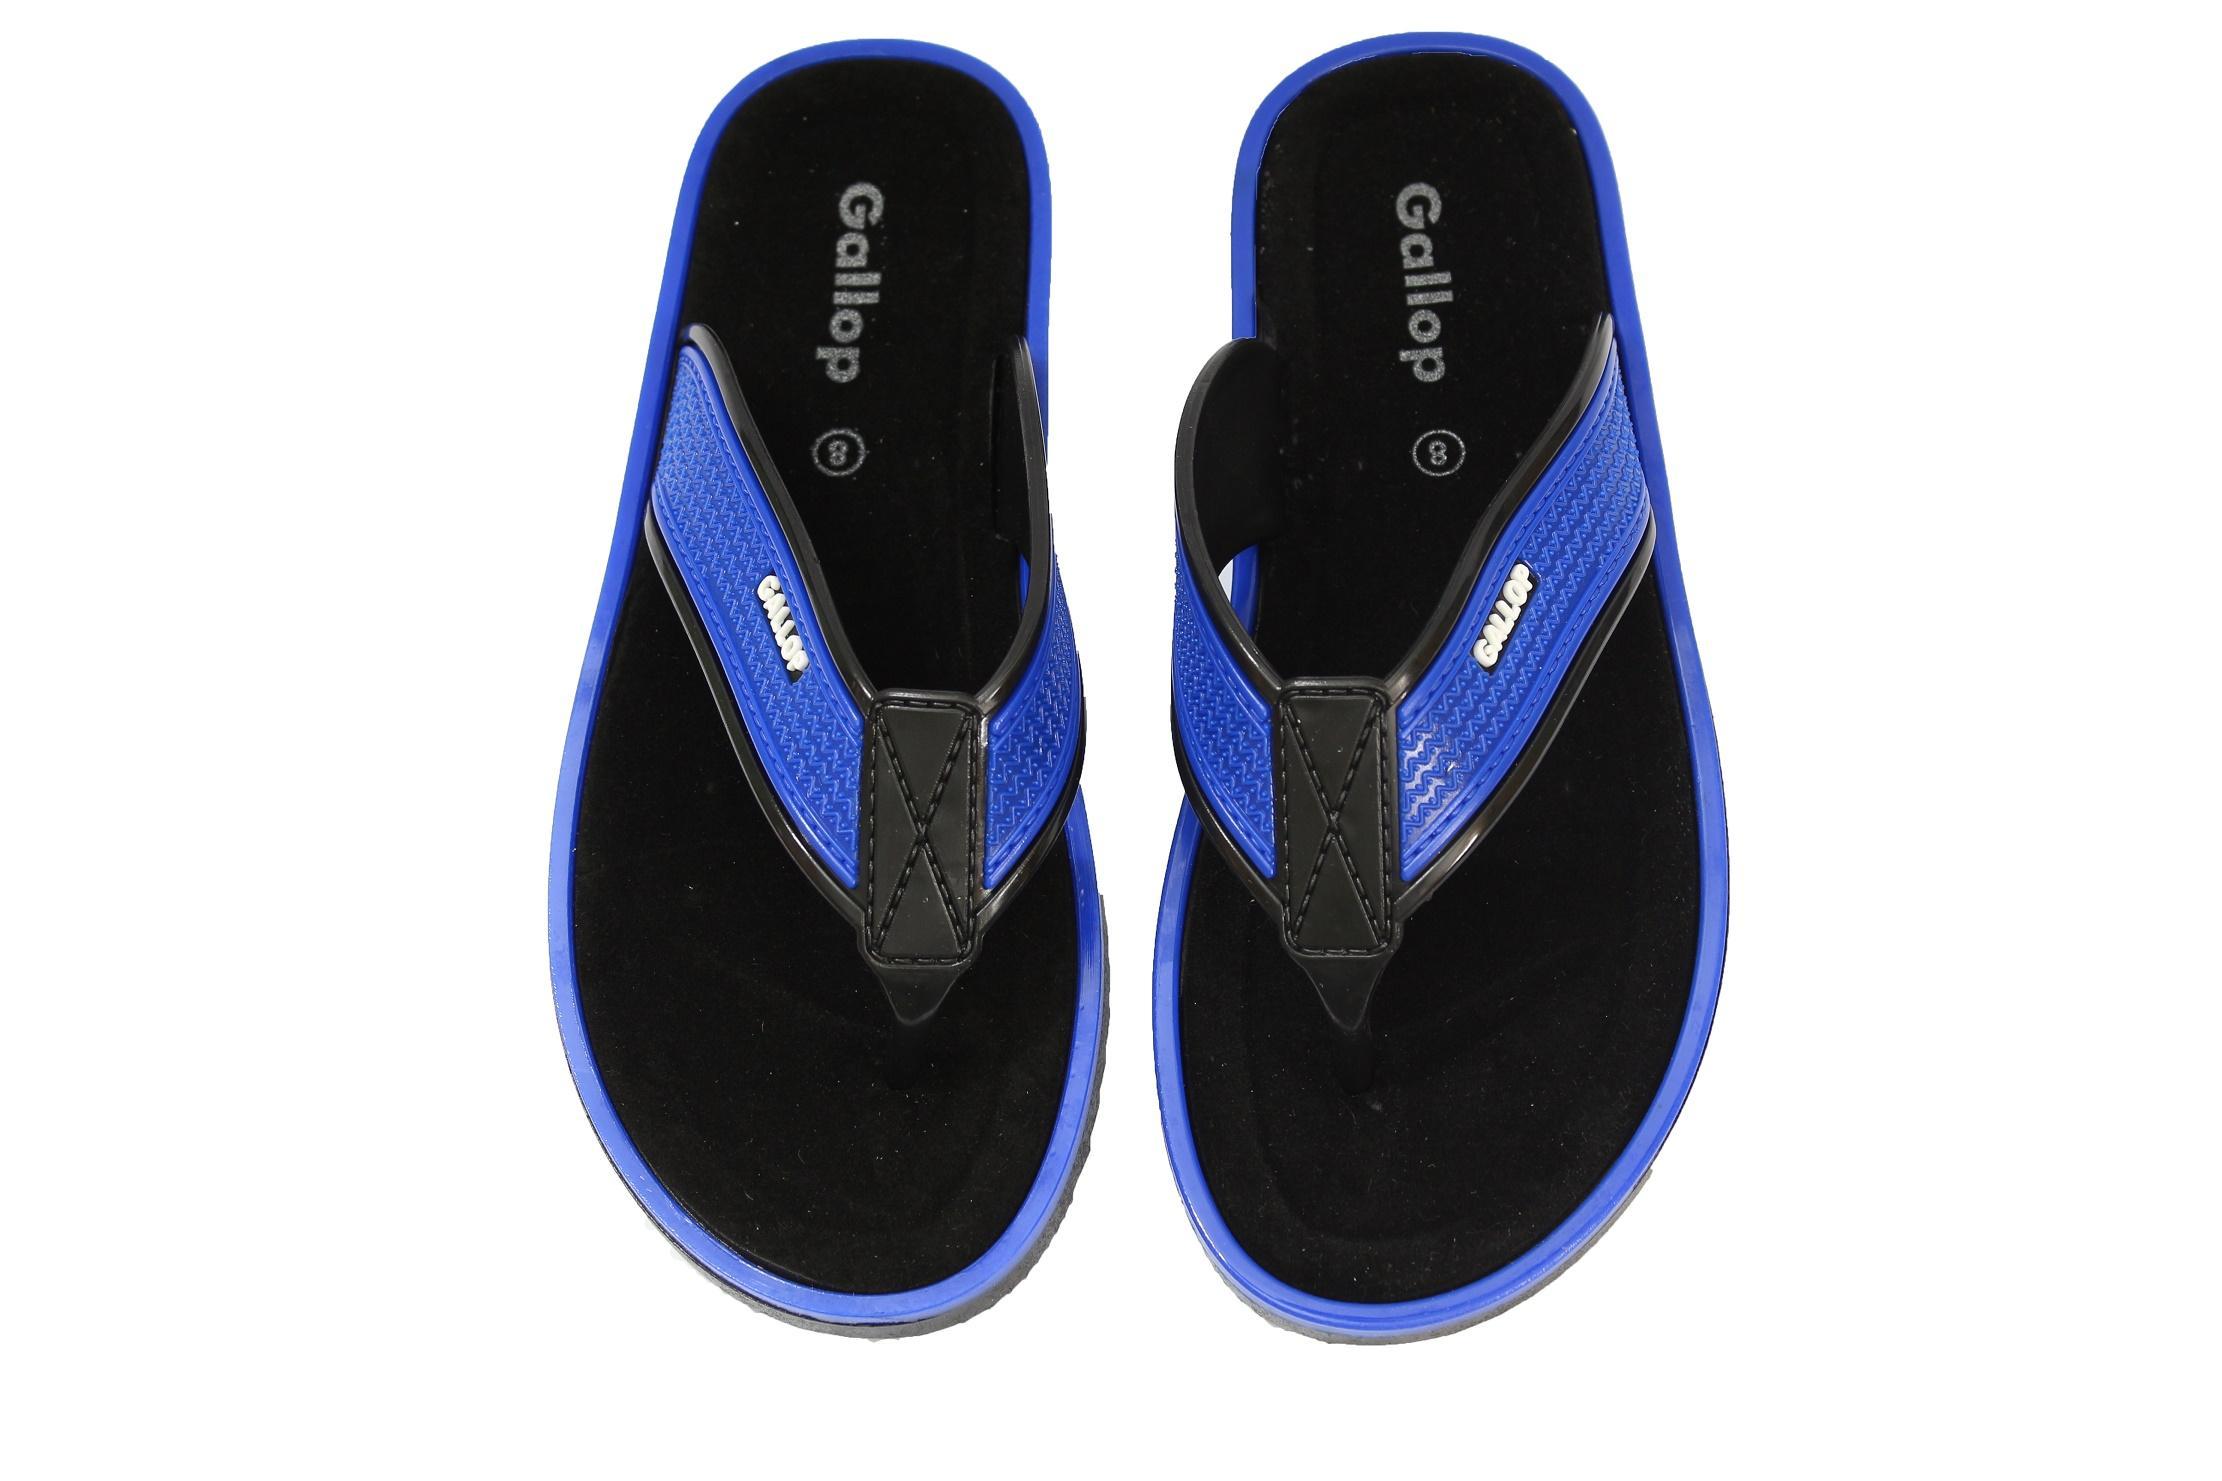 b5d7e004936 Buy Men Casual & Formal Shoes @ Best Price in Pakistan - Daraz.pk